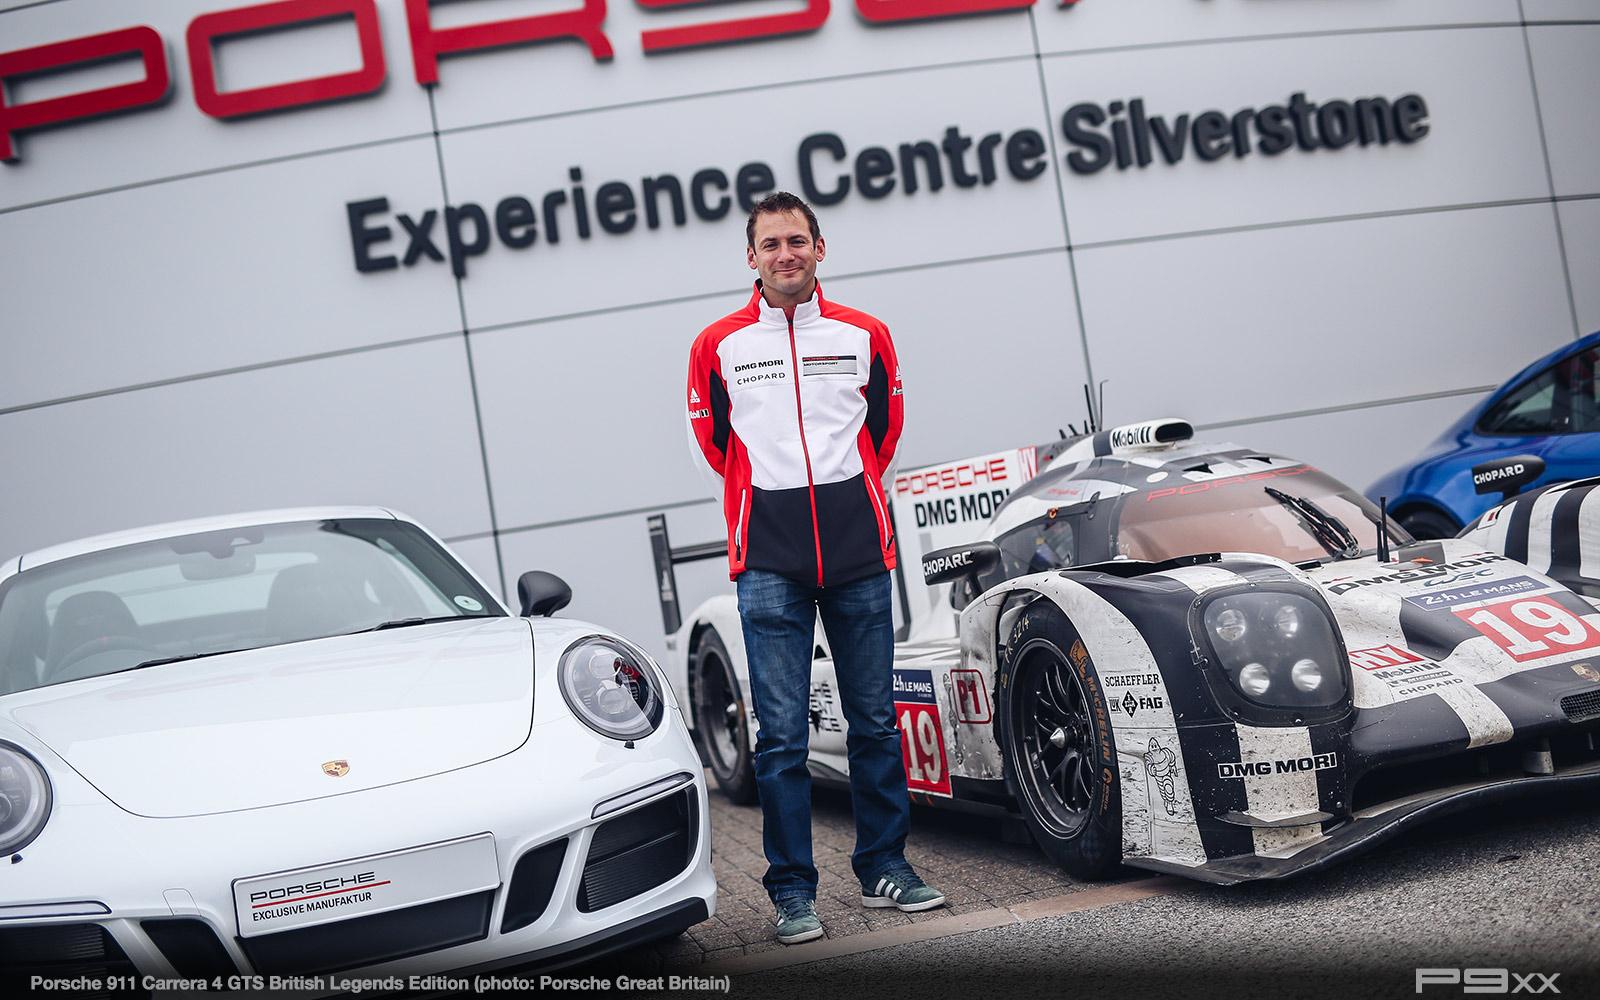 Porsche-911-Carrera-4-GTS-British-Legends-Edition-368